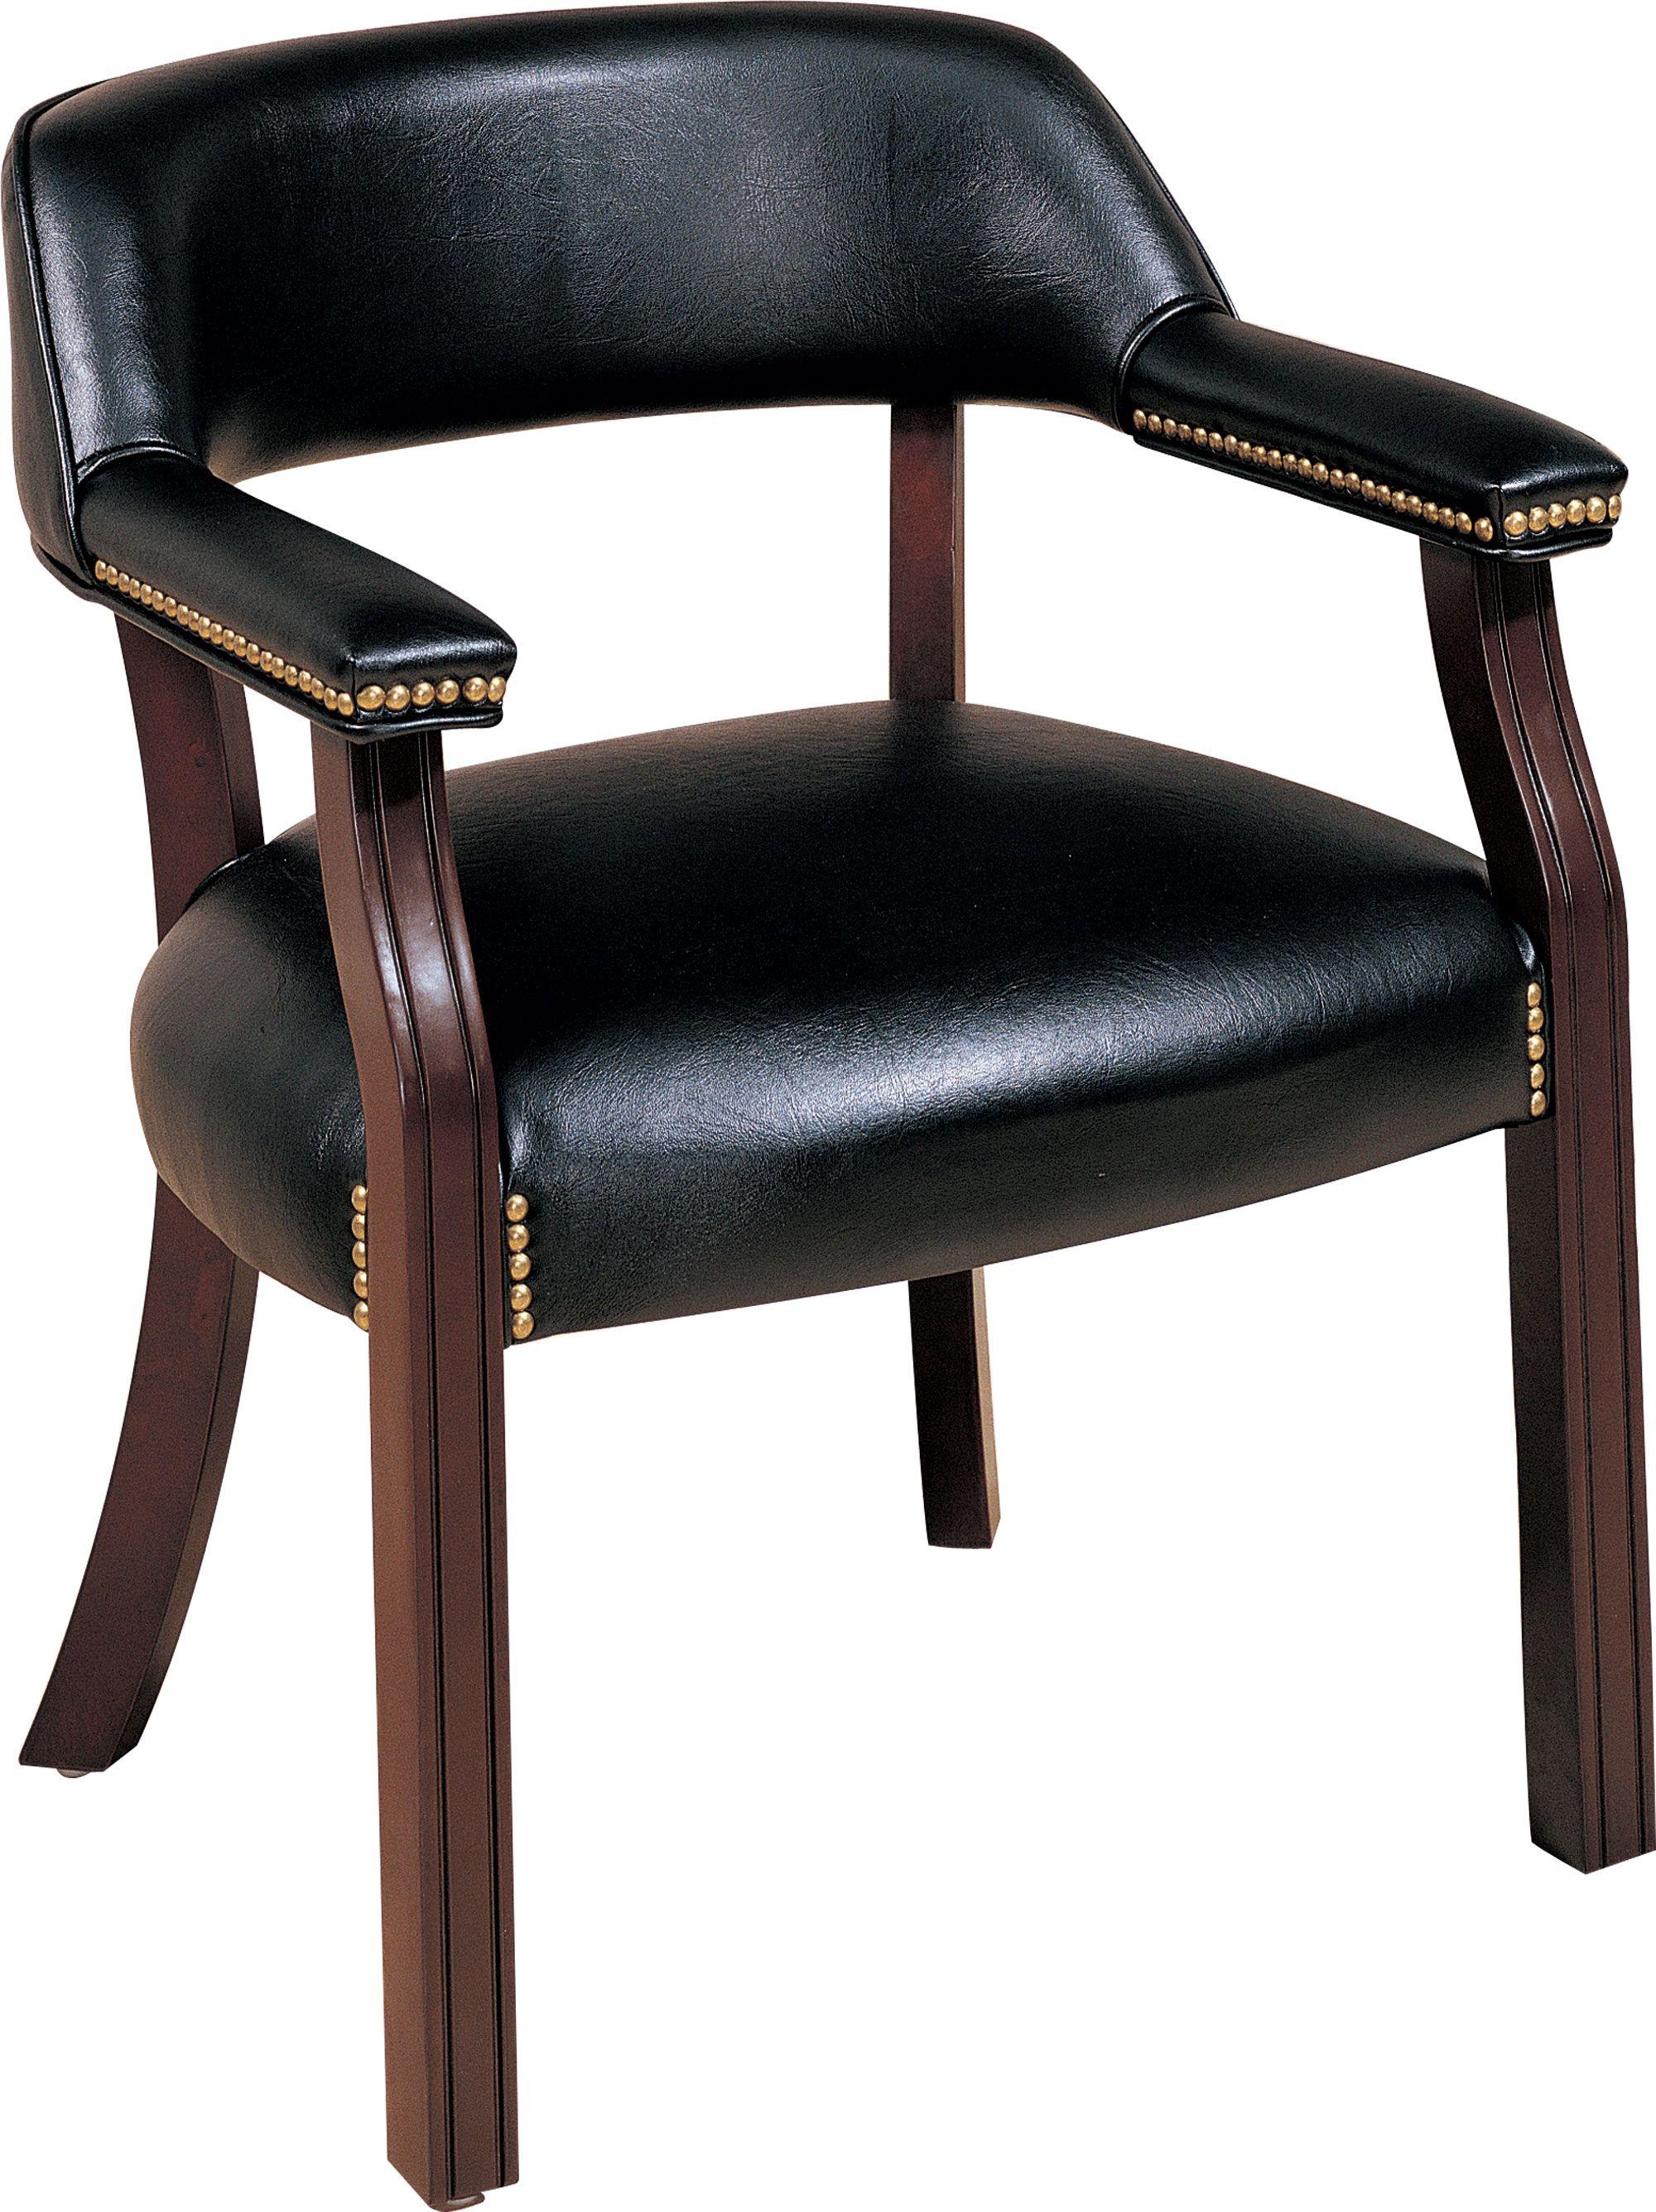 Bunte Burostuhle Buro Mobel Braun Buro Stuhl Hoch Desk Chair Premium